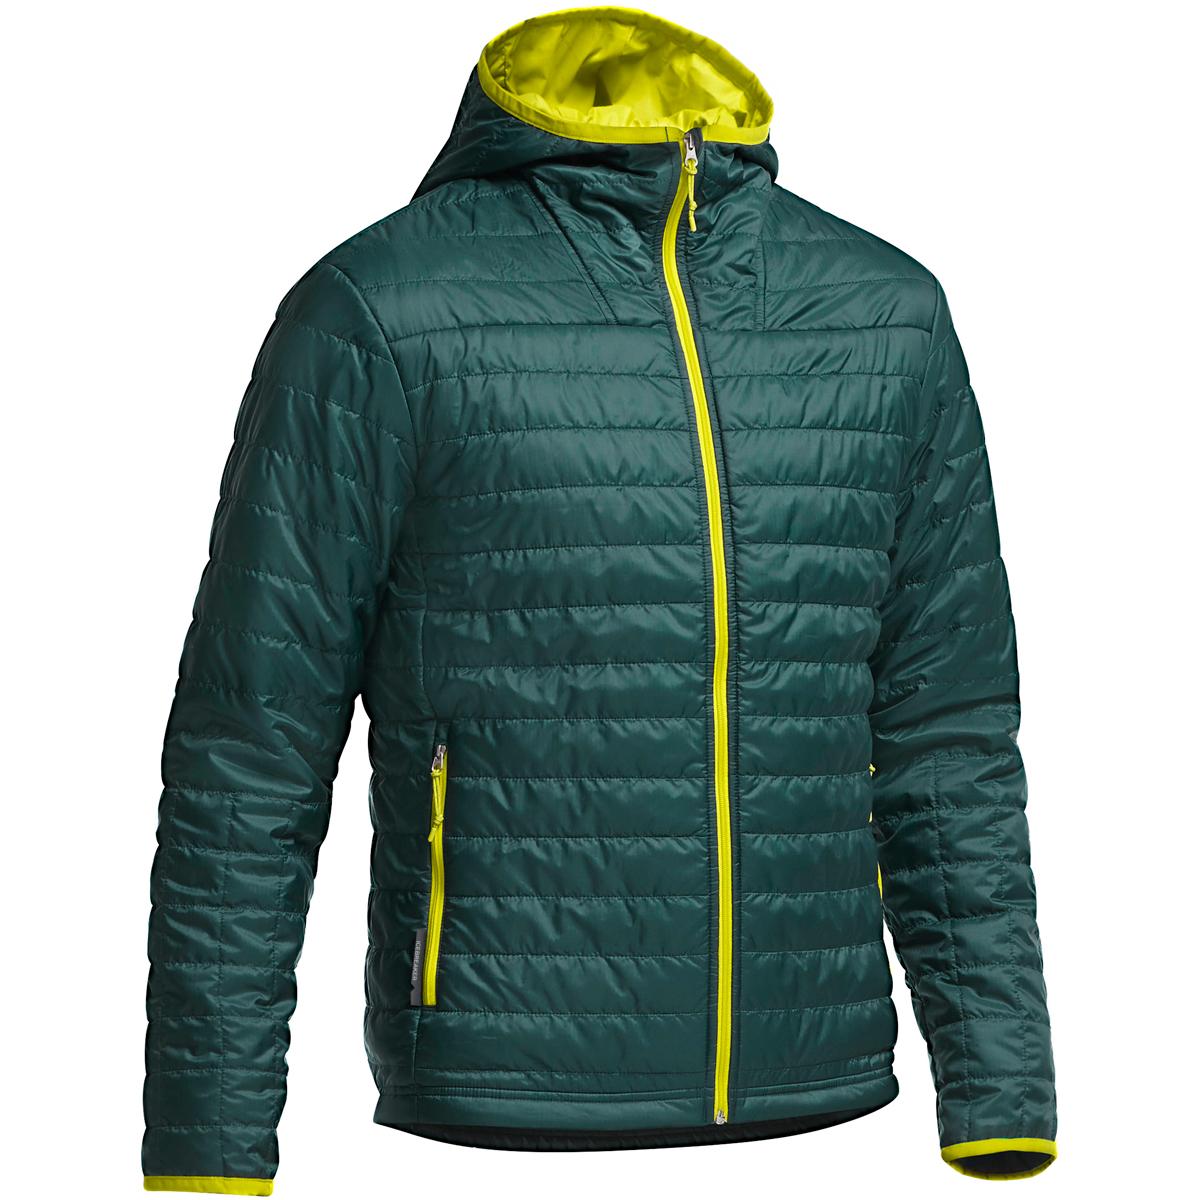 Icebreaker - Helix LS Zip Hood Pine/Chartreuse/Chartreuse - Isolation & Winter Jackets - L